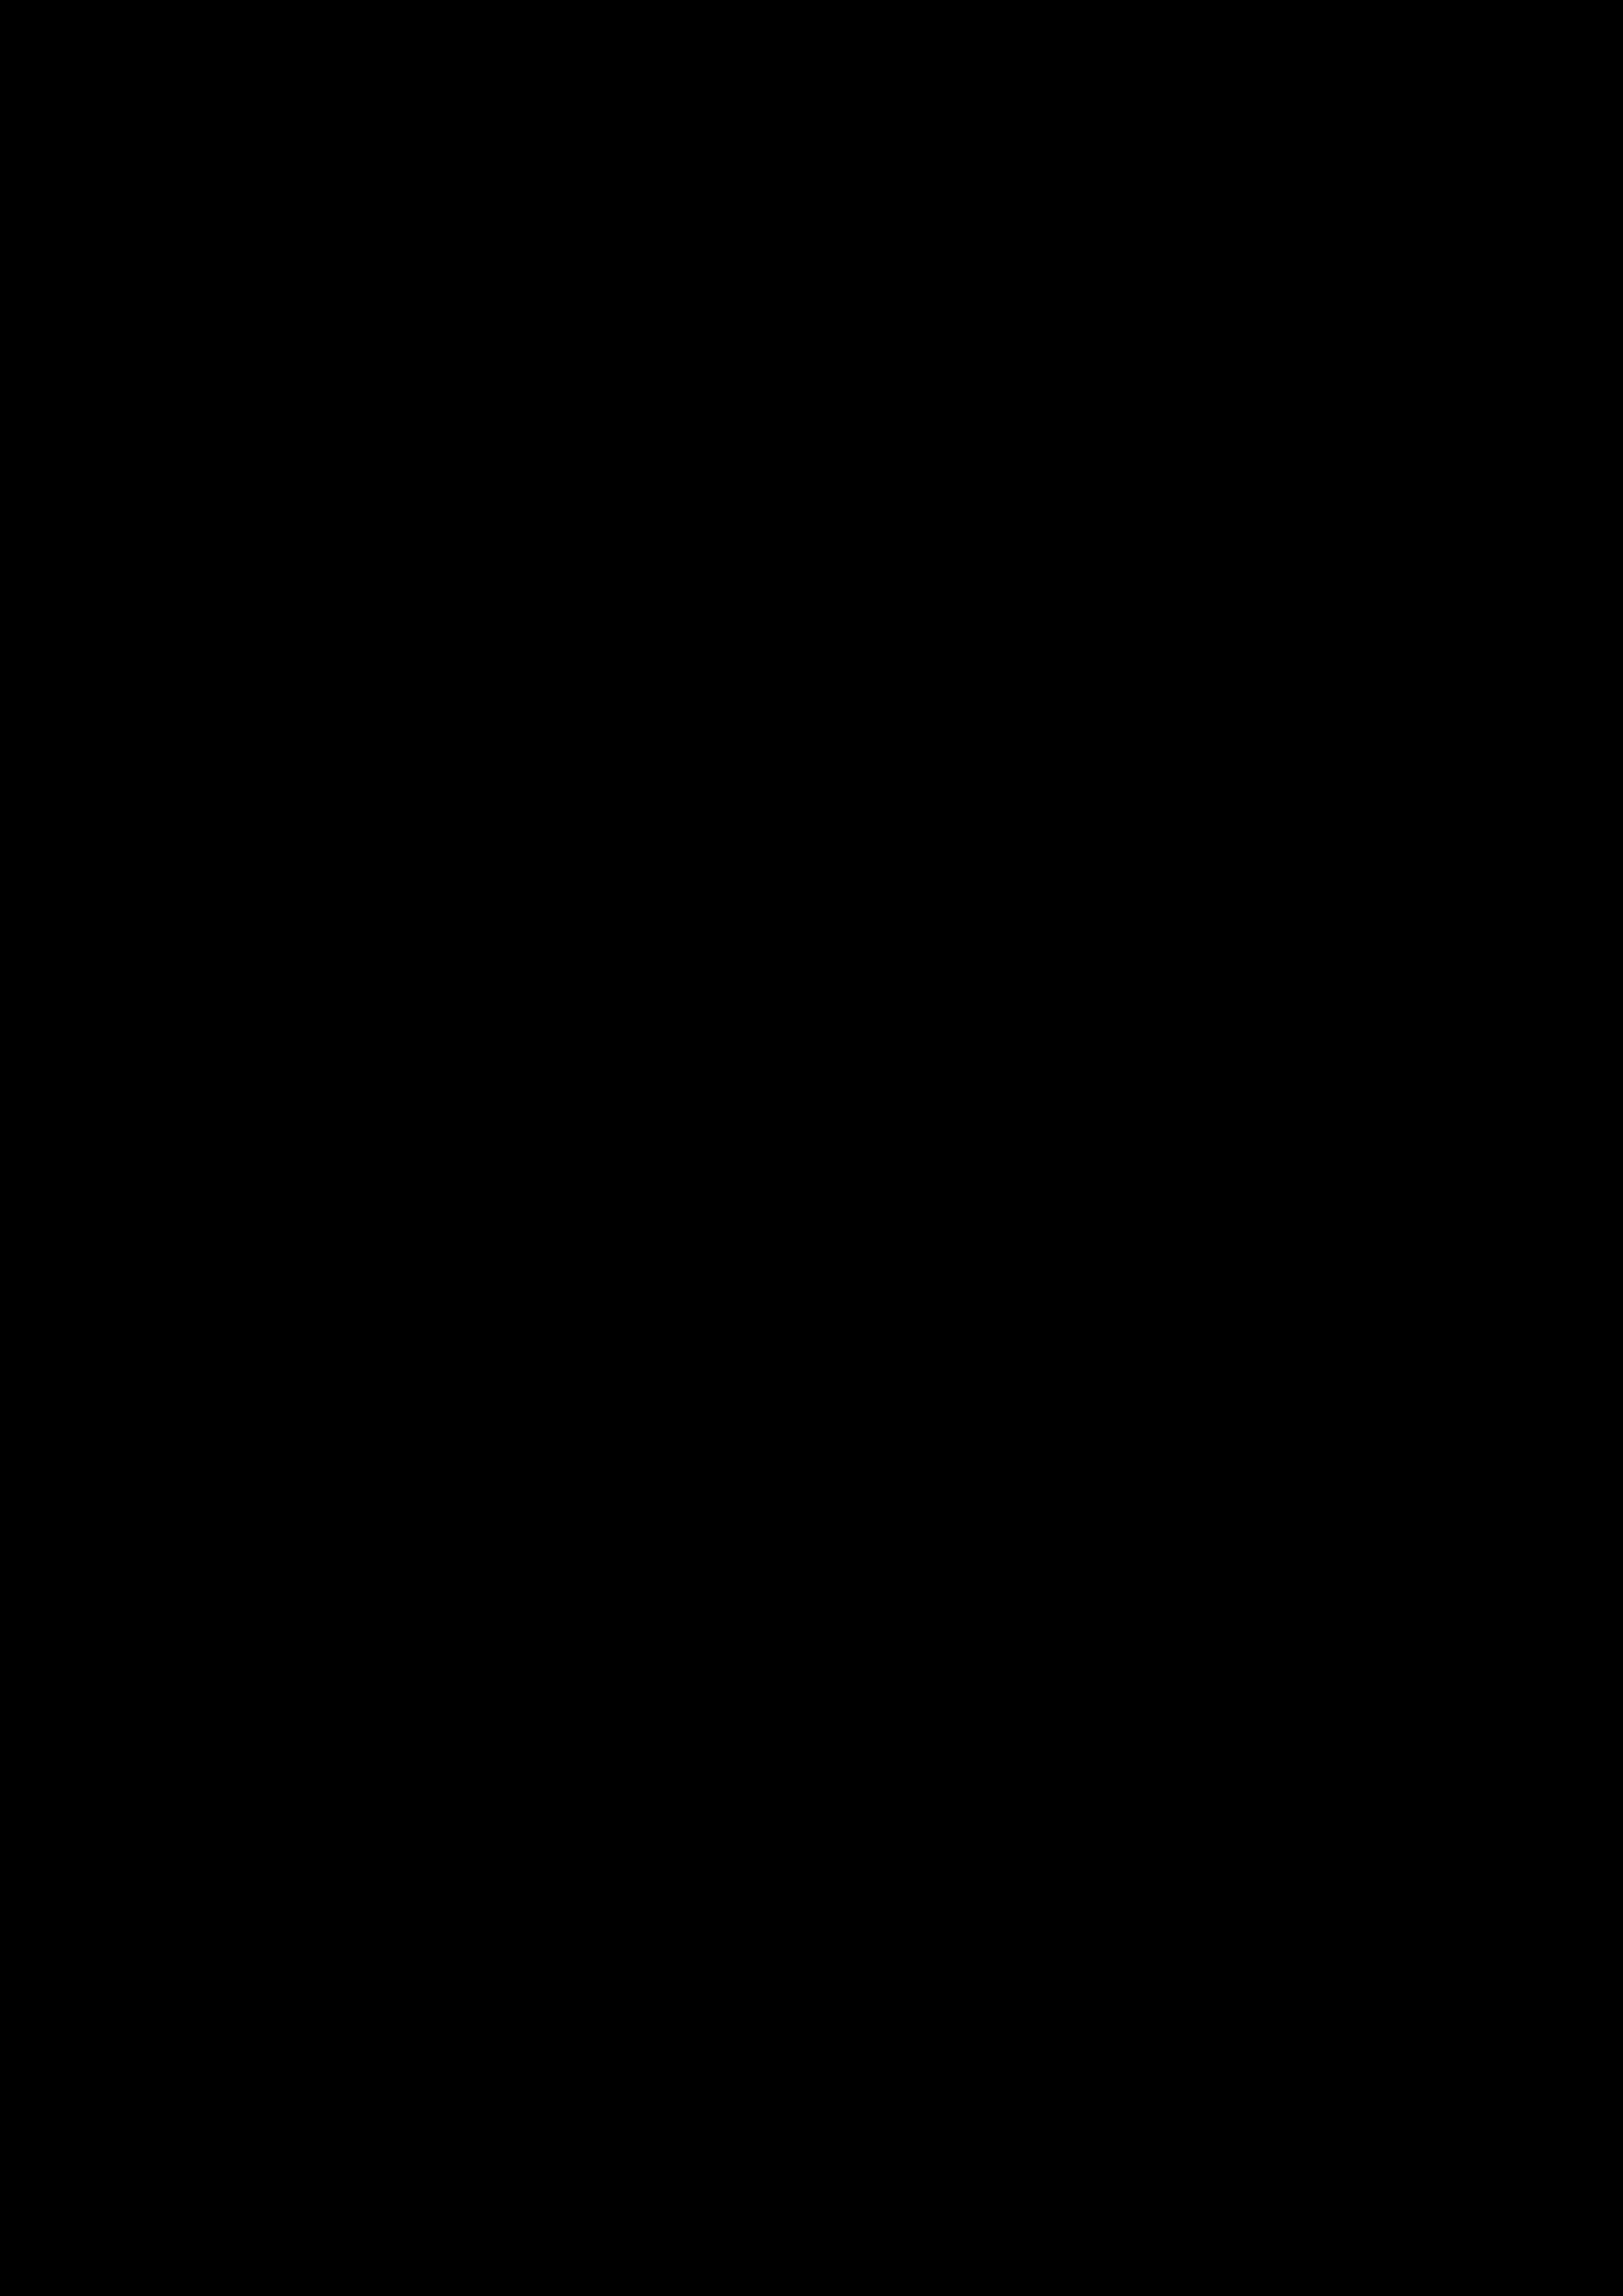 1697x2400 Clipart Sea Animals Silhouettes Seahorse Silhouette